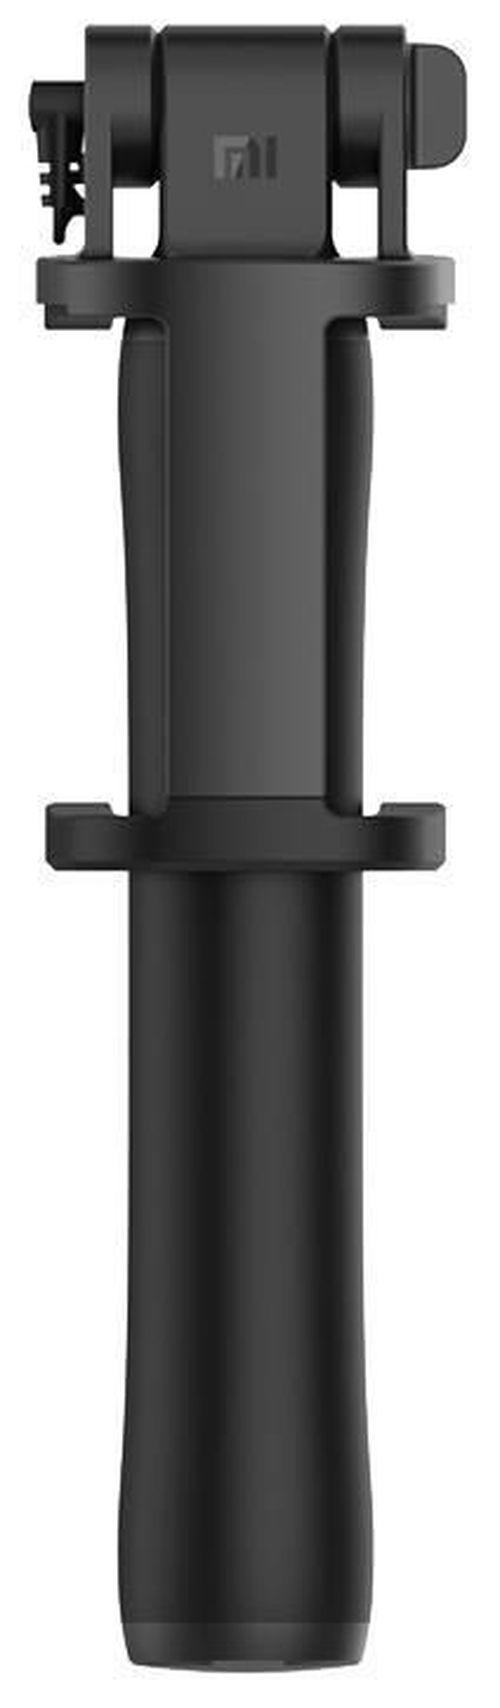 купить Штатив Xiaomi Mi Selfie Stick (XMZPG04YM/FBA4054GL) в Кишинёве